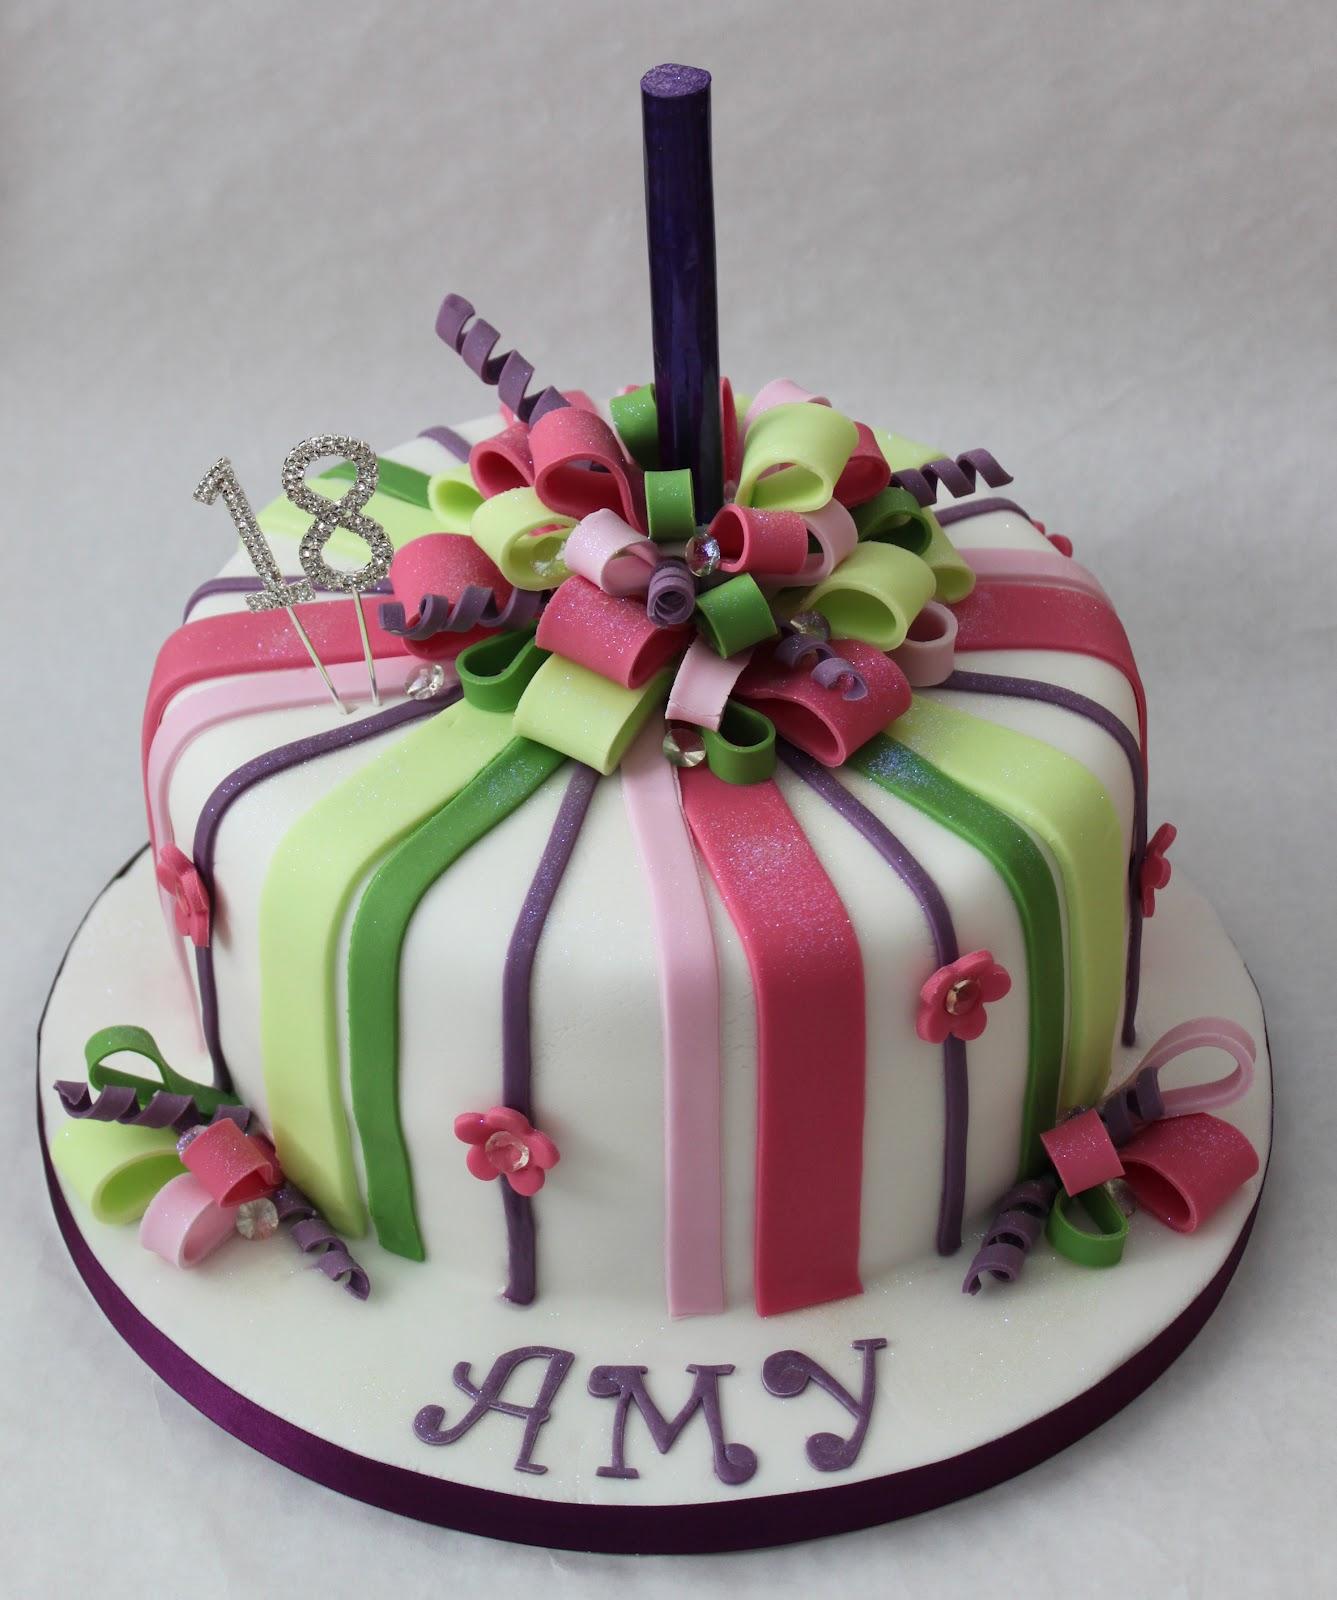 Snowballs In Summer: Ribbon Cake